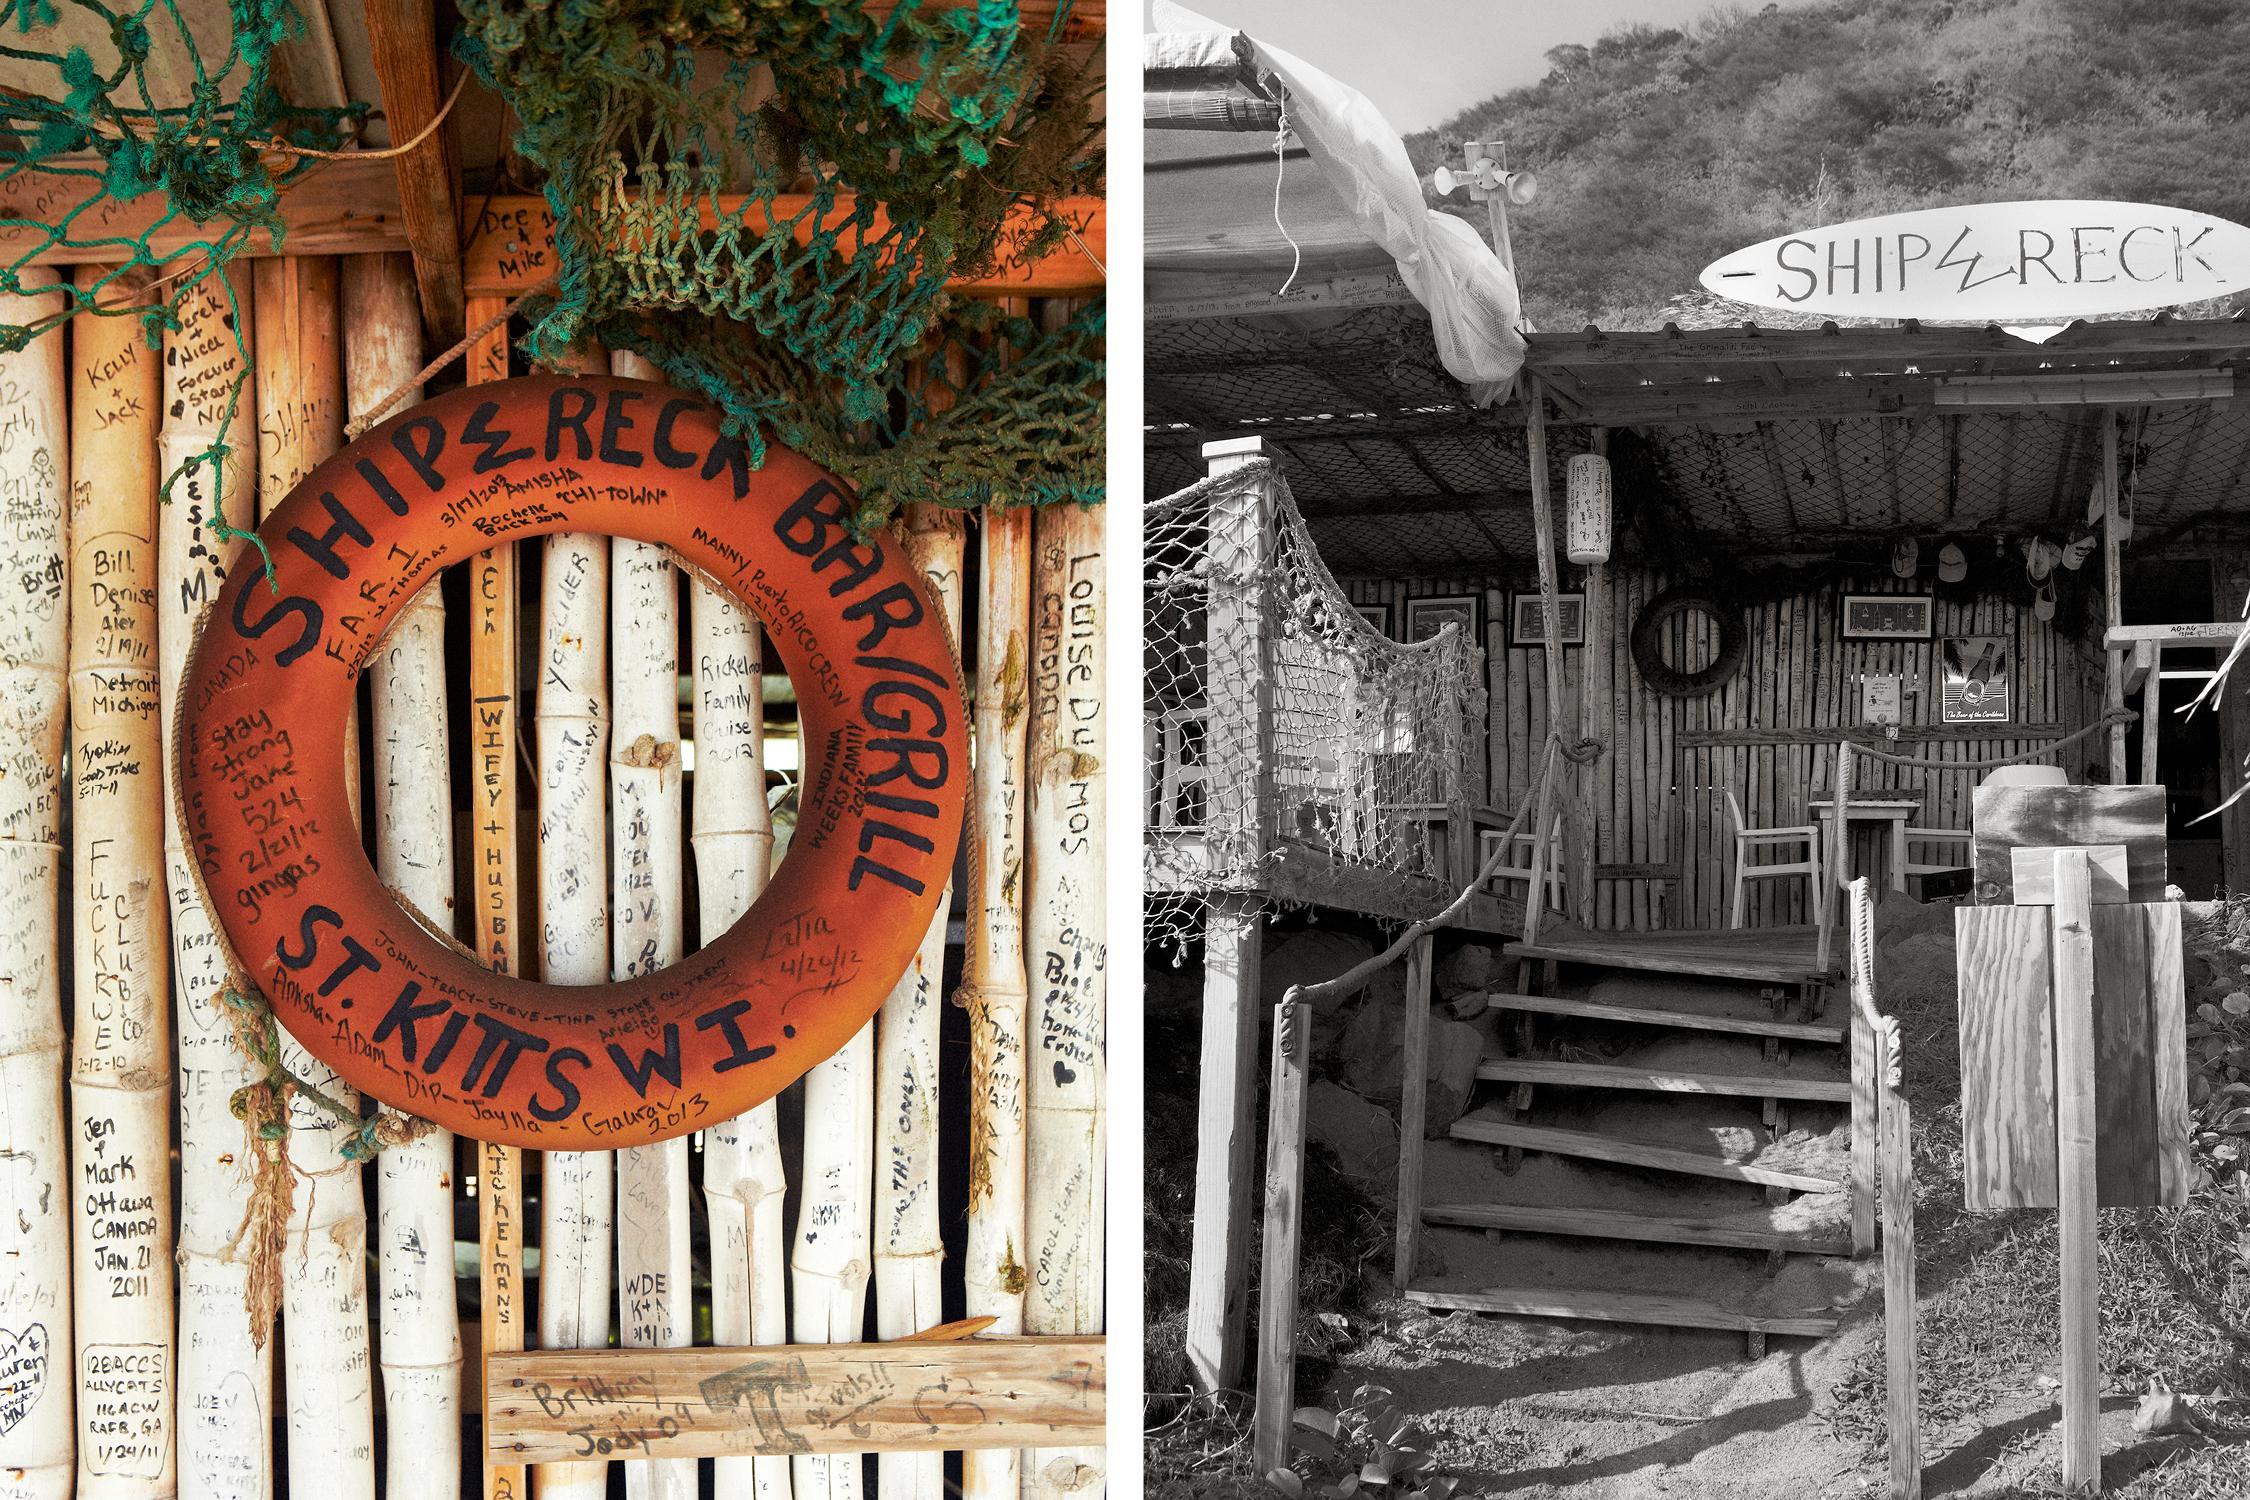 SHIPWRECK BEACH BAR AND GRILL